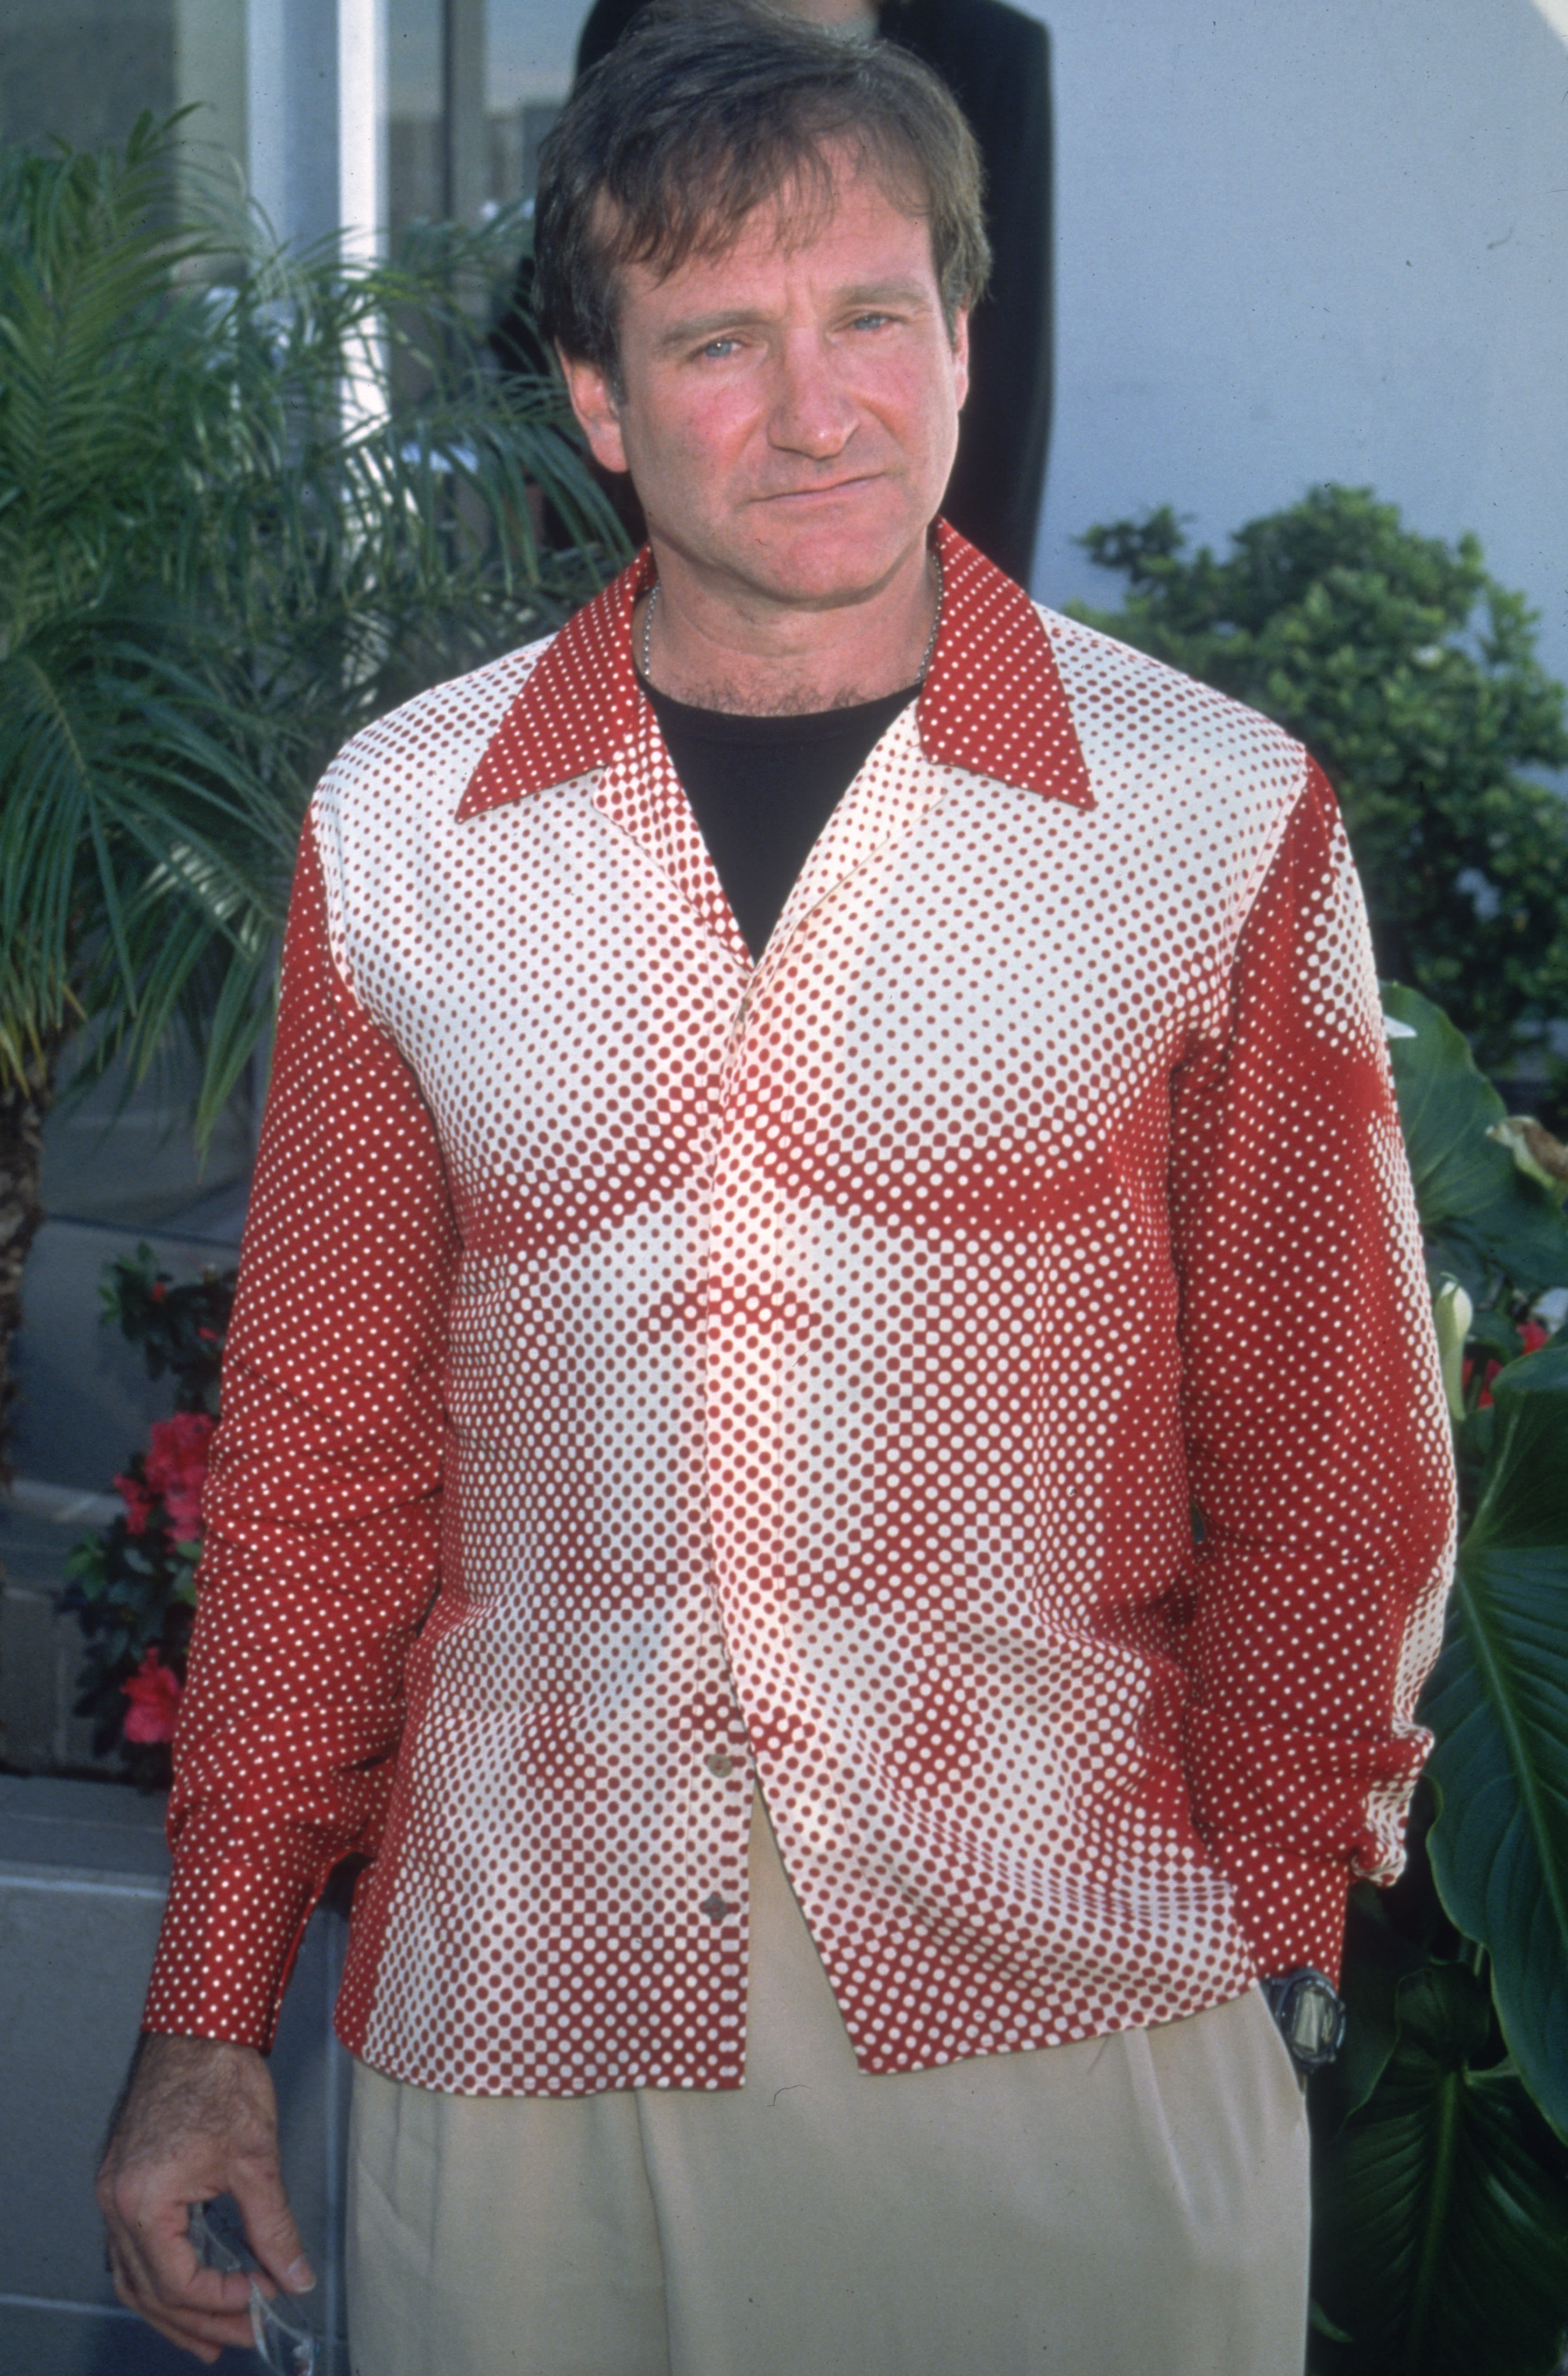 robin williams jean paul gaultier - neomag.